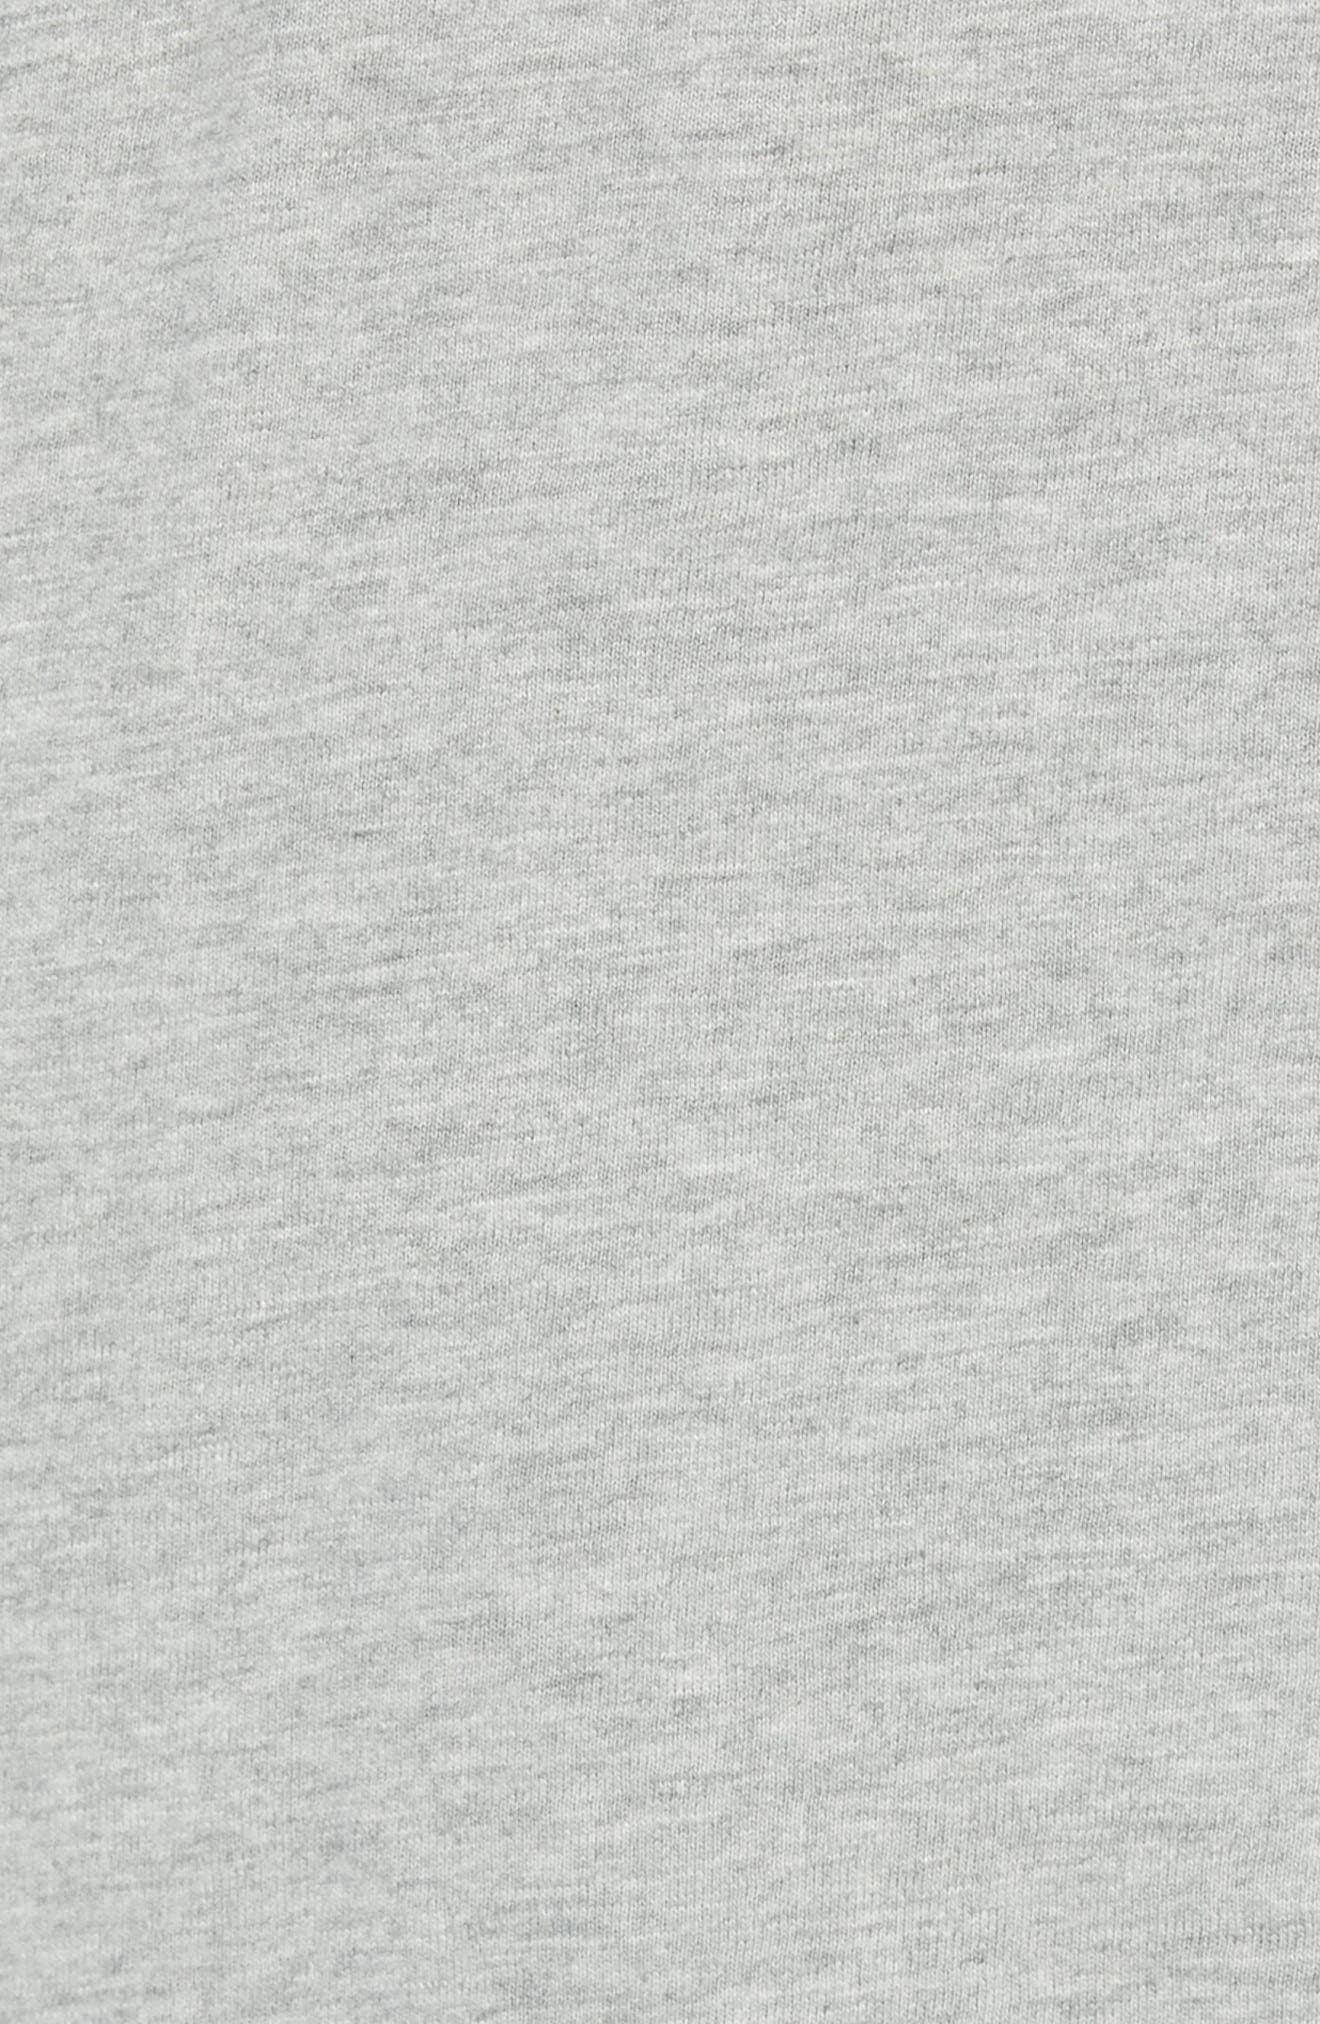 Slim Fit Garment Dyed Slub Cotton Henley,                             Alternate thumbnail 5, color,                             020